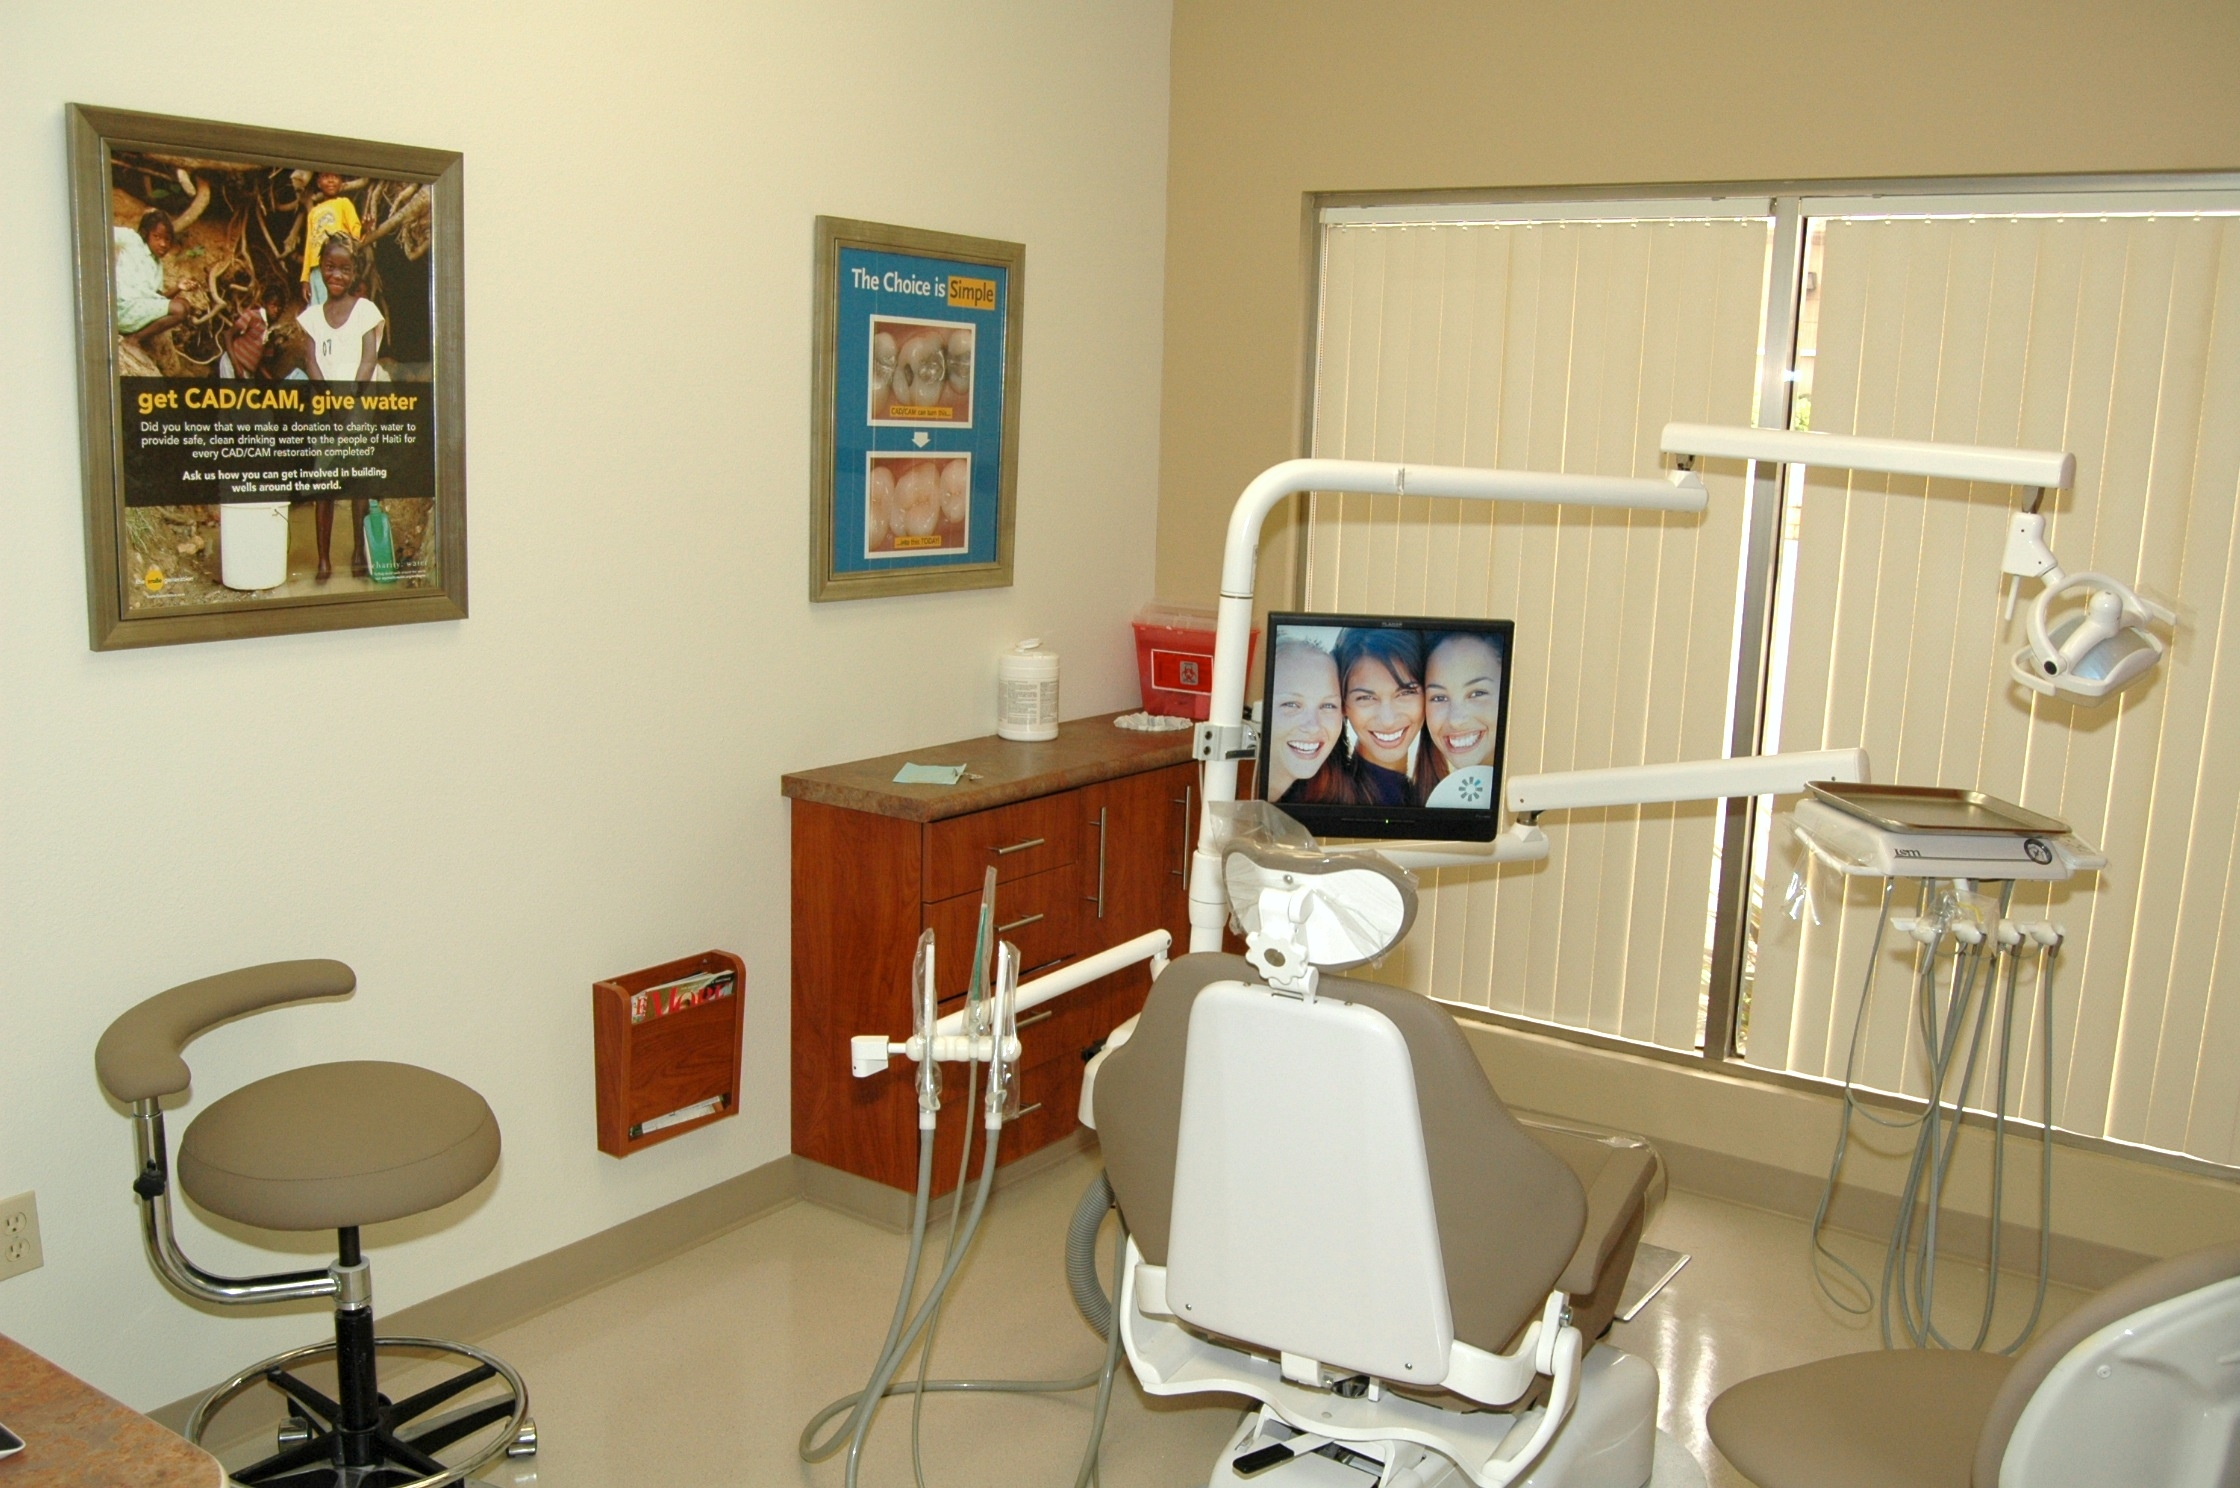 Yorba Linda Smiles Dentistry and Orthodontics image 3